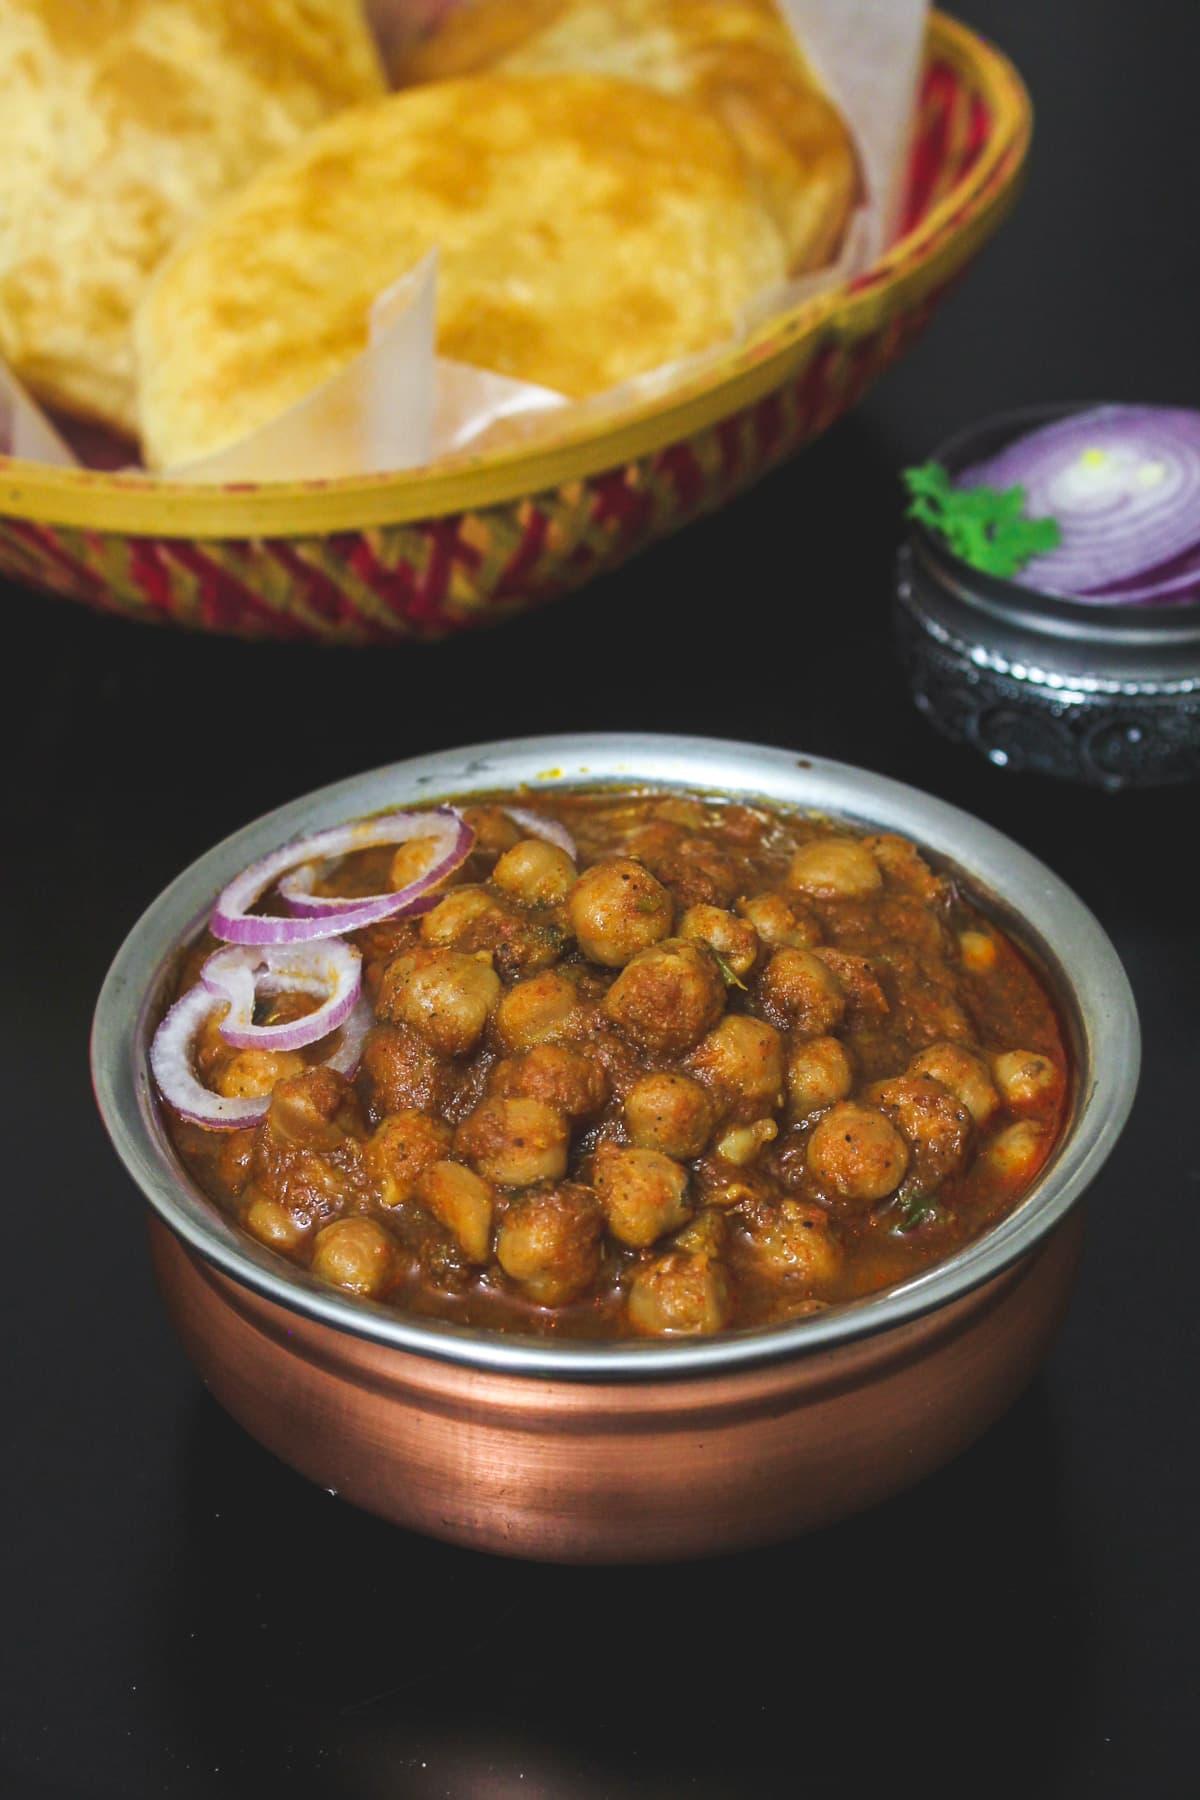 Close up of chole masala garnished with onion rings.